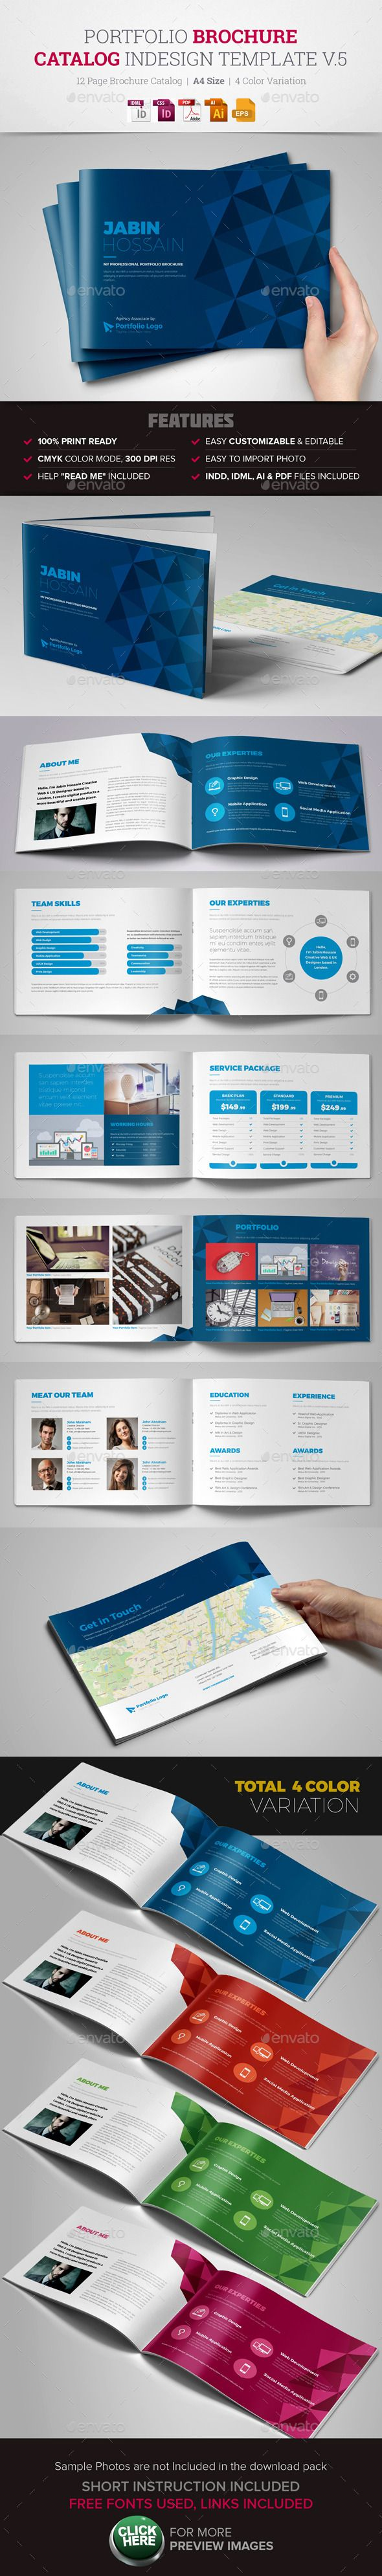 Portfolio Brochure InDesign Template #design Buy Now: http://graphicriver.net/item/portfolio-brochure-indesign-template-v5-/12858255?ref=ksioks